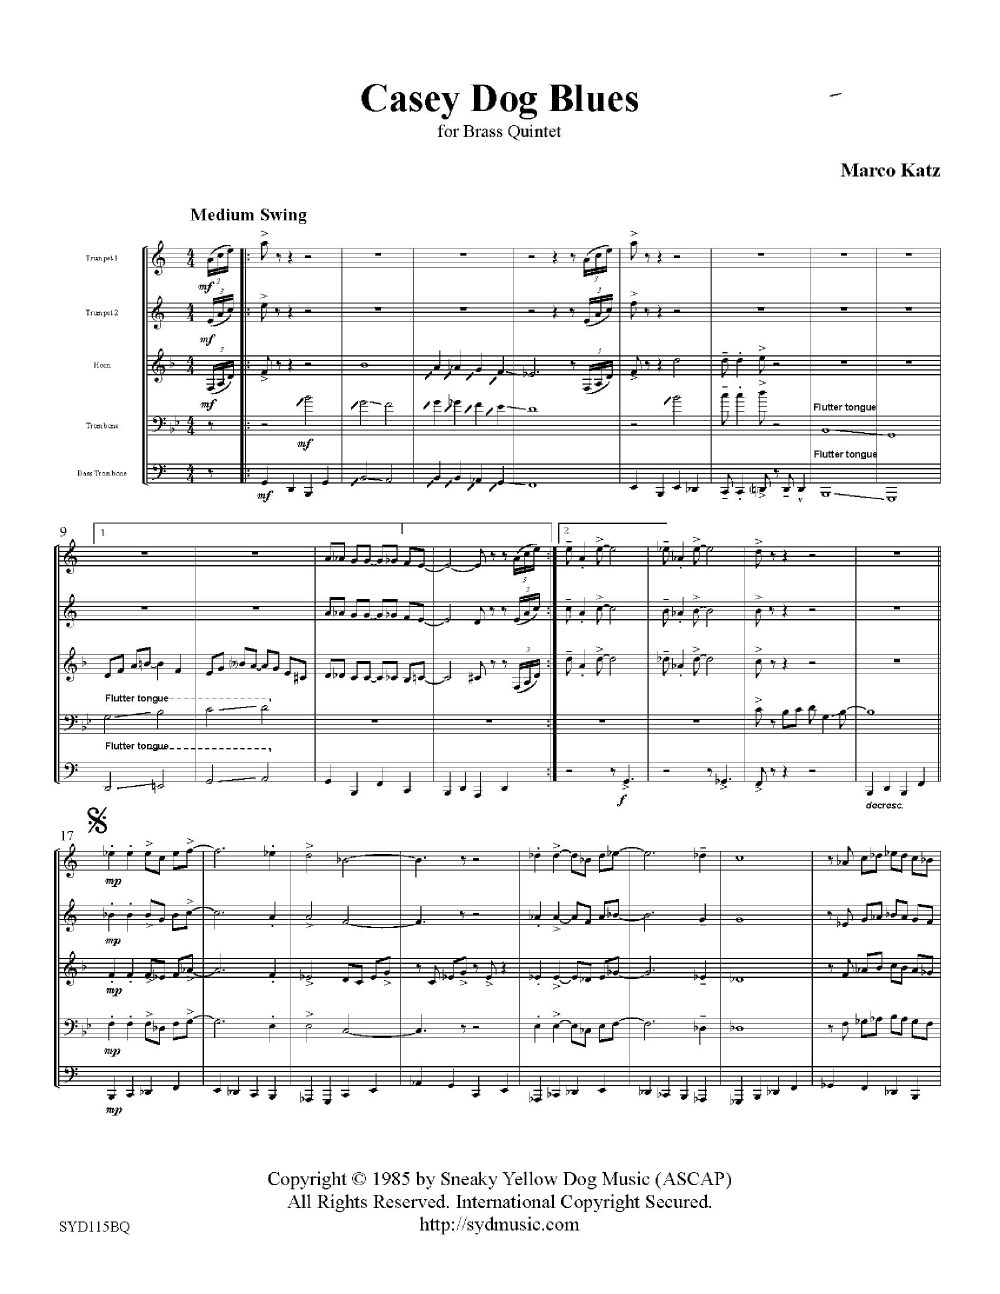 Casey Dog Blues-Brass Quintet Thumbnail